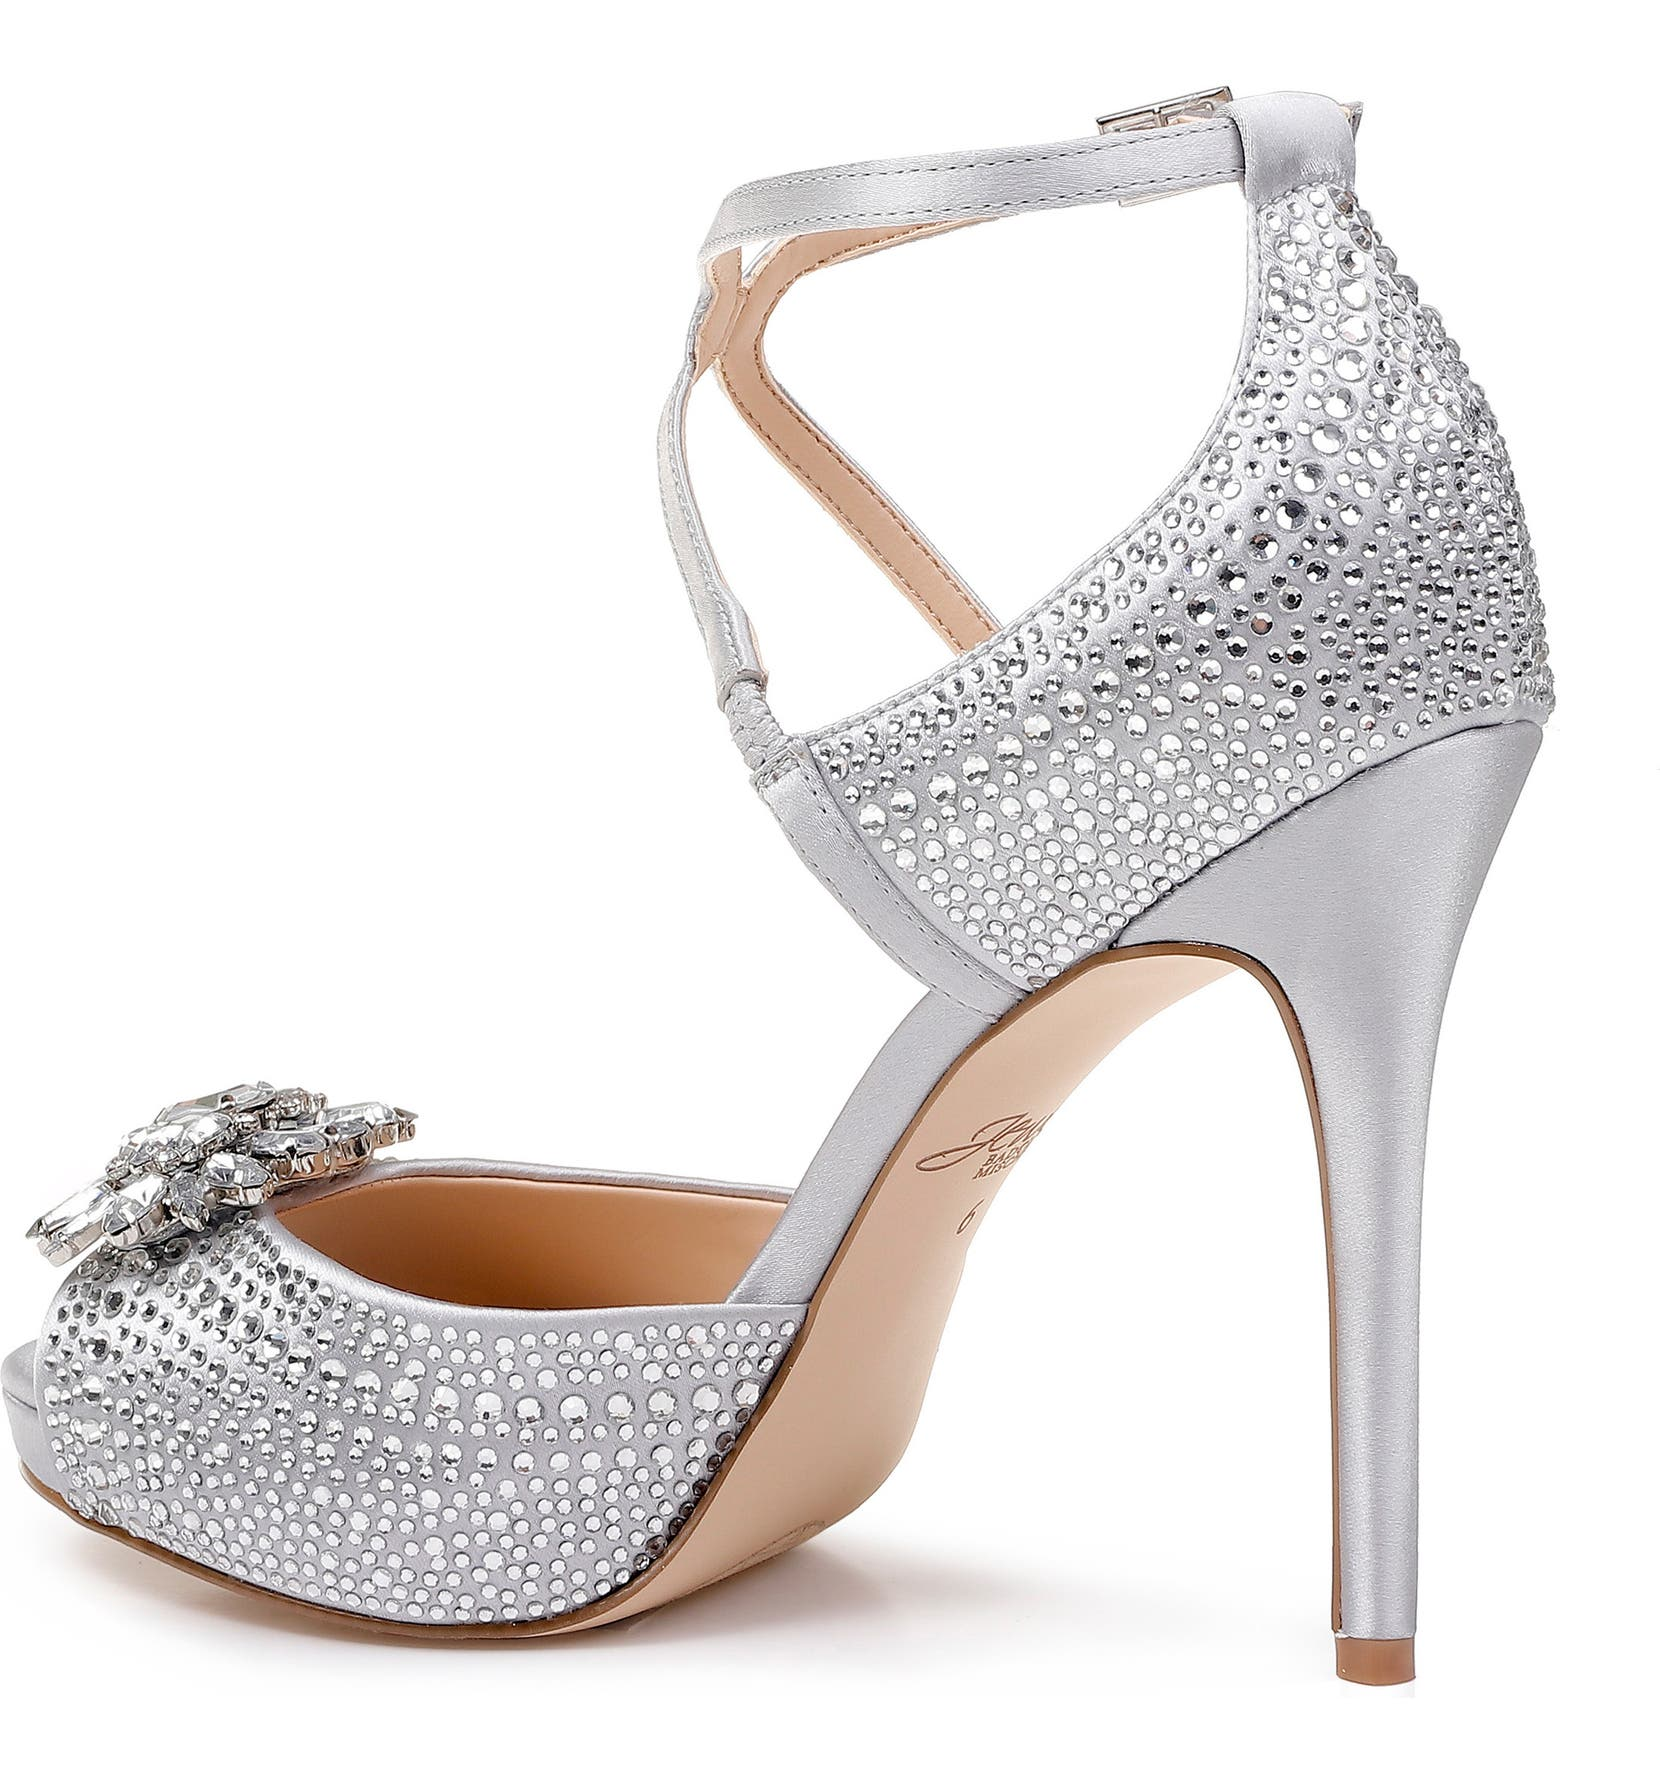 0843535e2ccb Jewel Badgley Mischka Zaina Platform Sandal (Women)